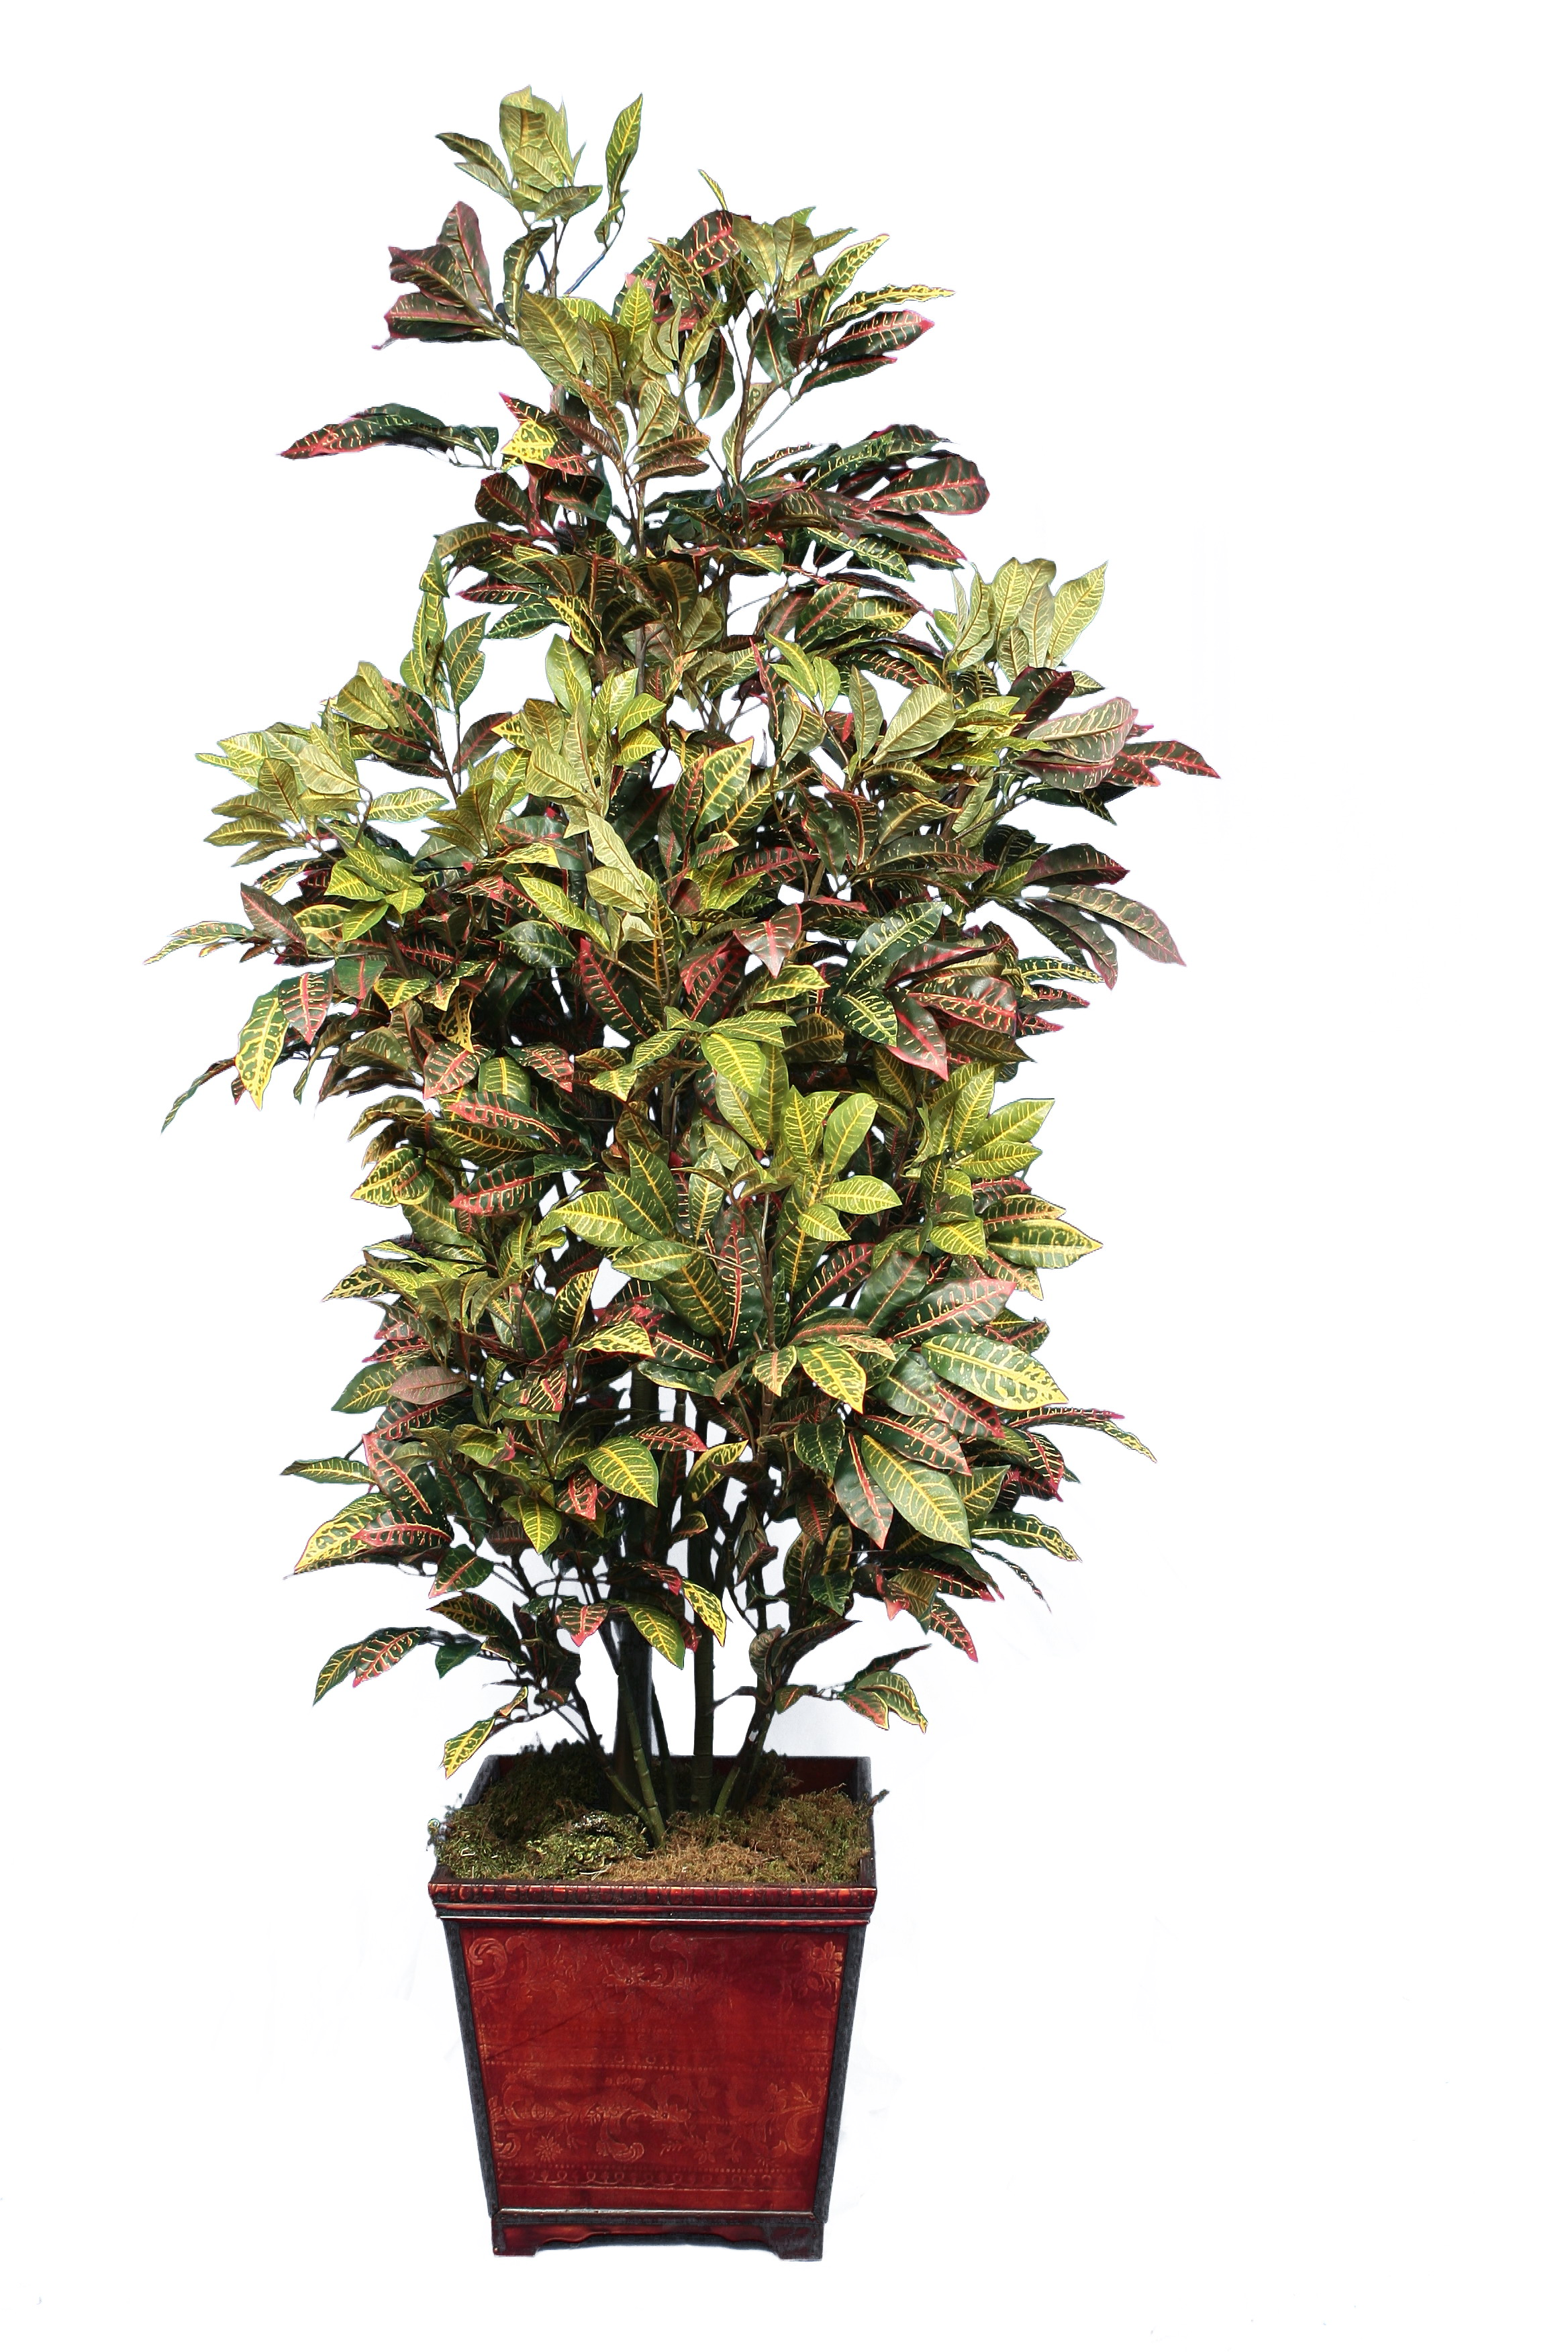 TSP 3571- Croton